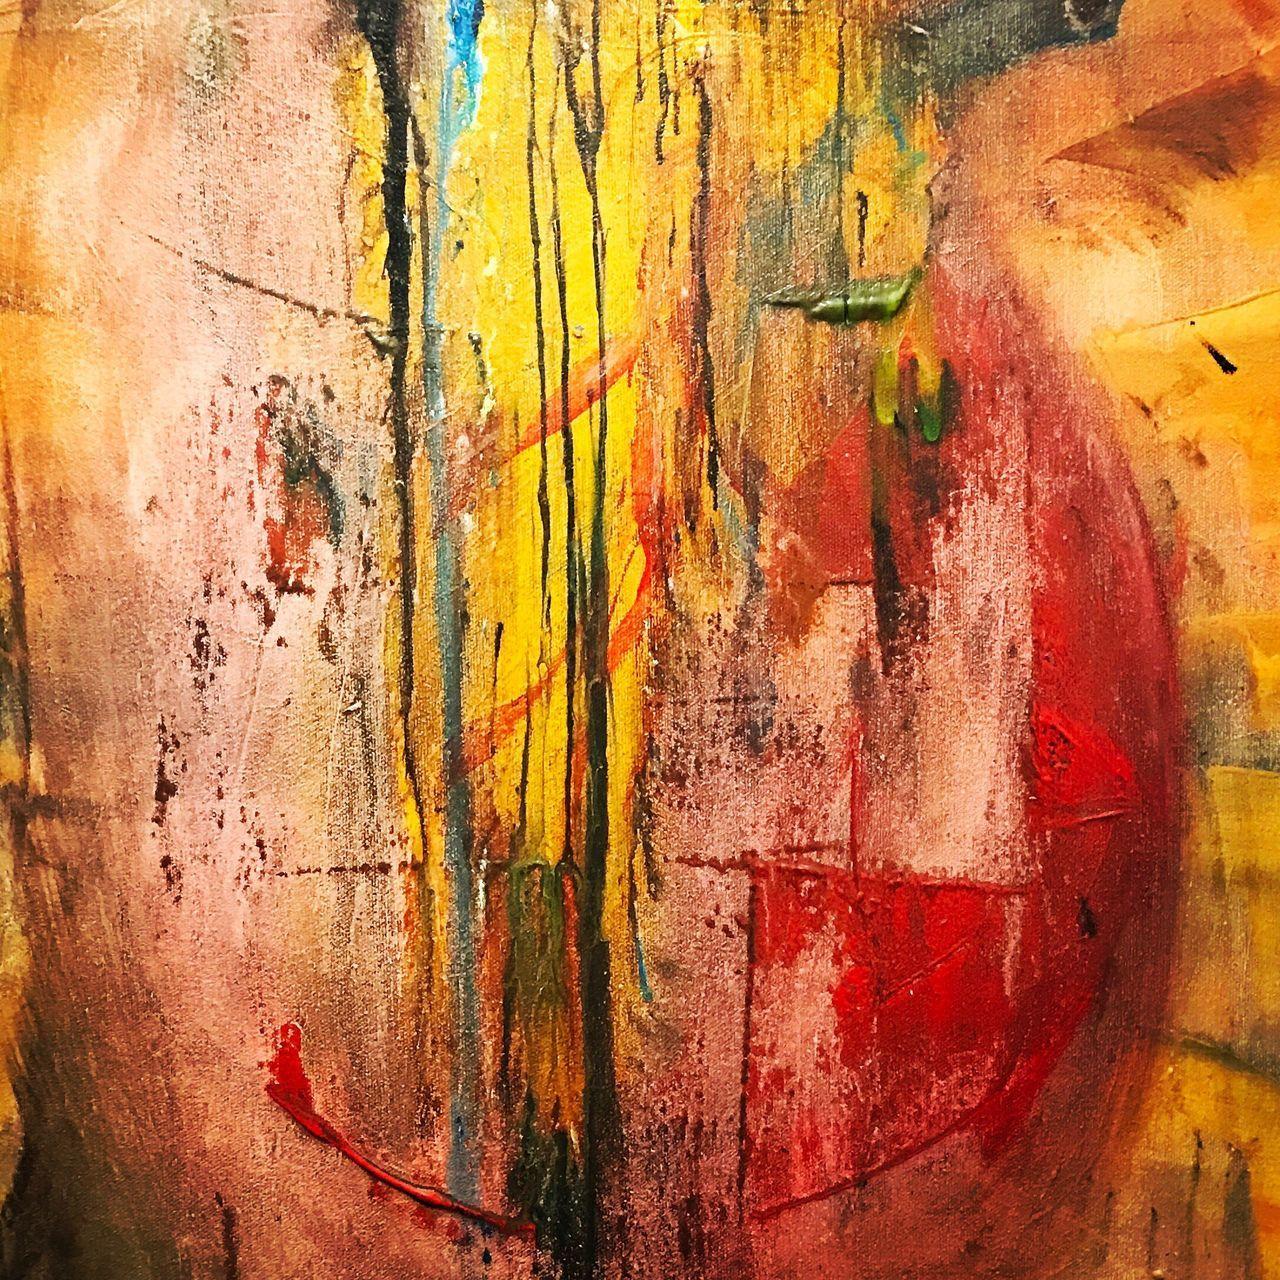 Trauma Artwork NYC By Mookrulz